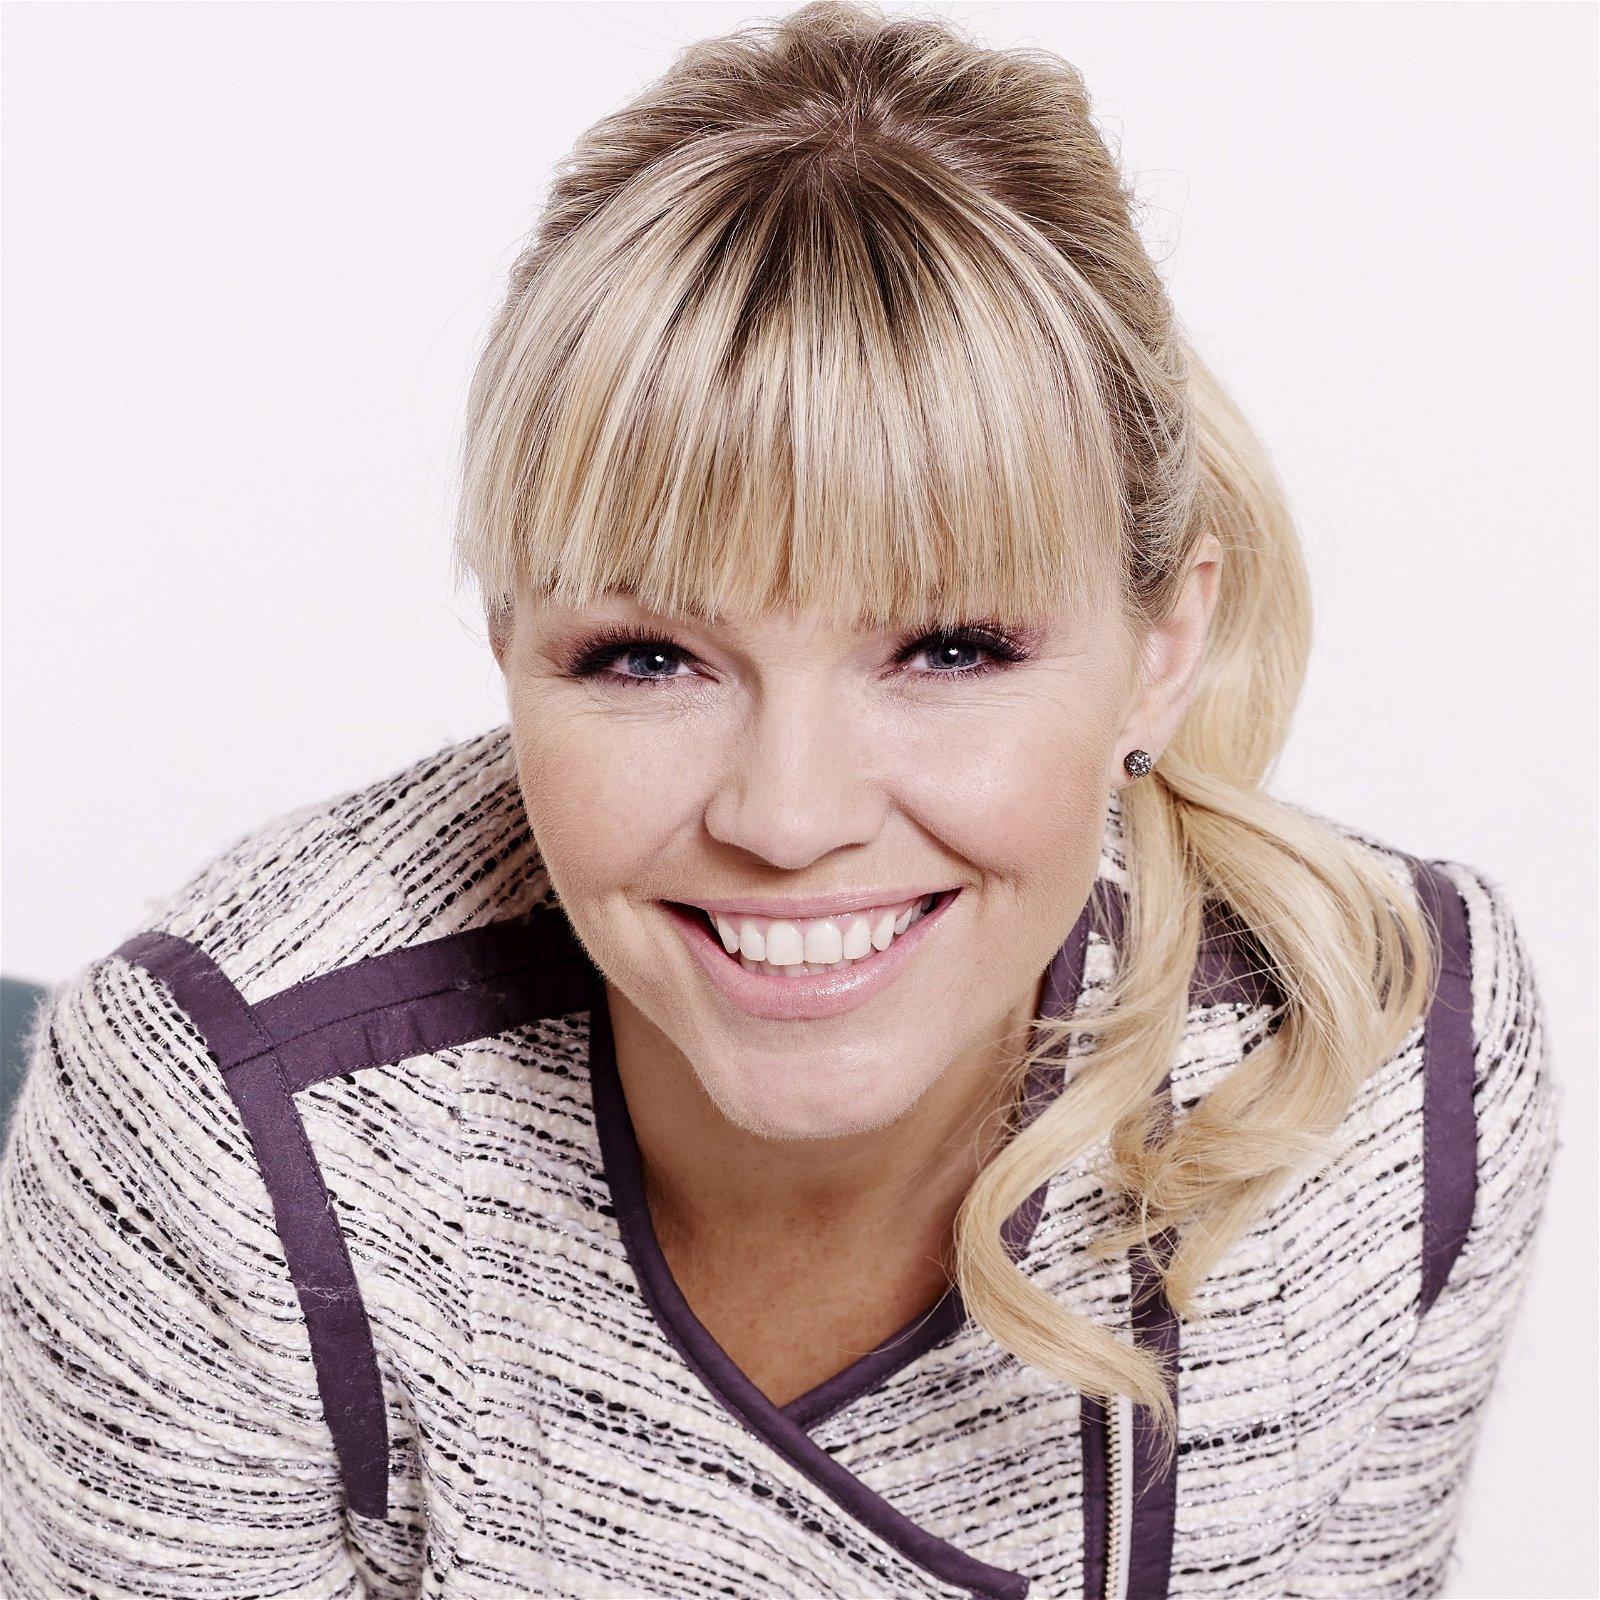 Kate-Thornton-TV-broadcaster-presenter-at-Great-British-Speakers